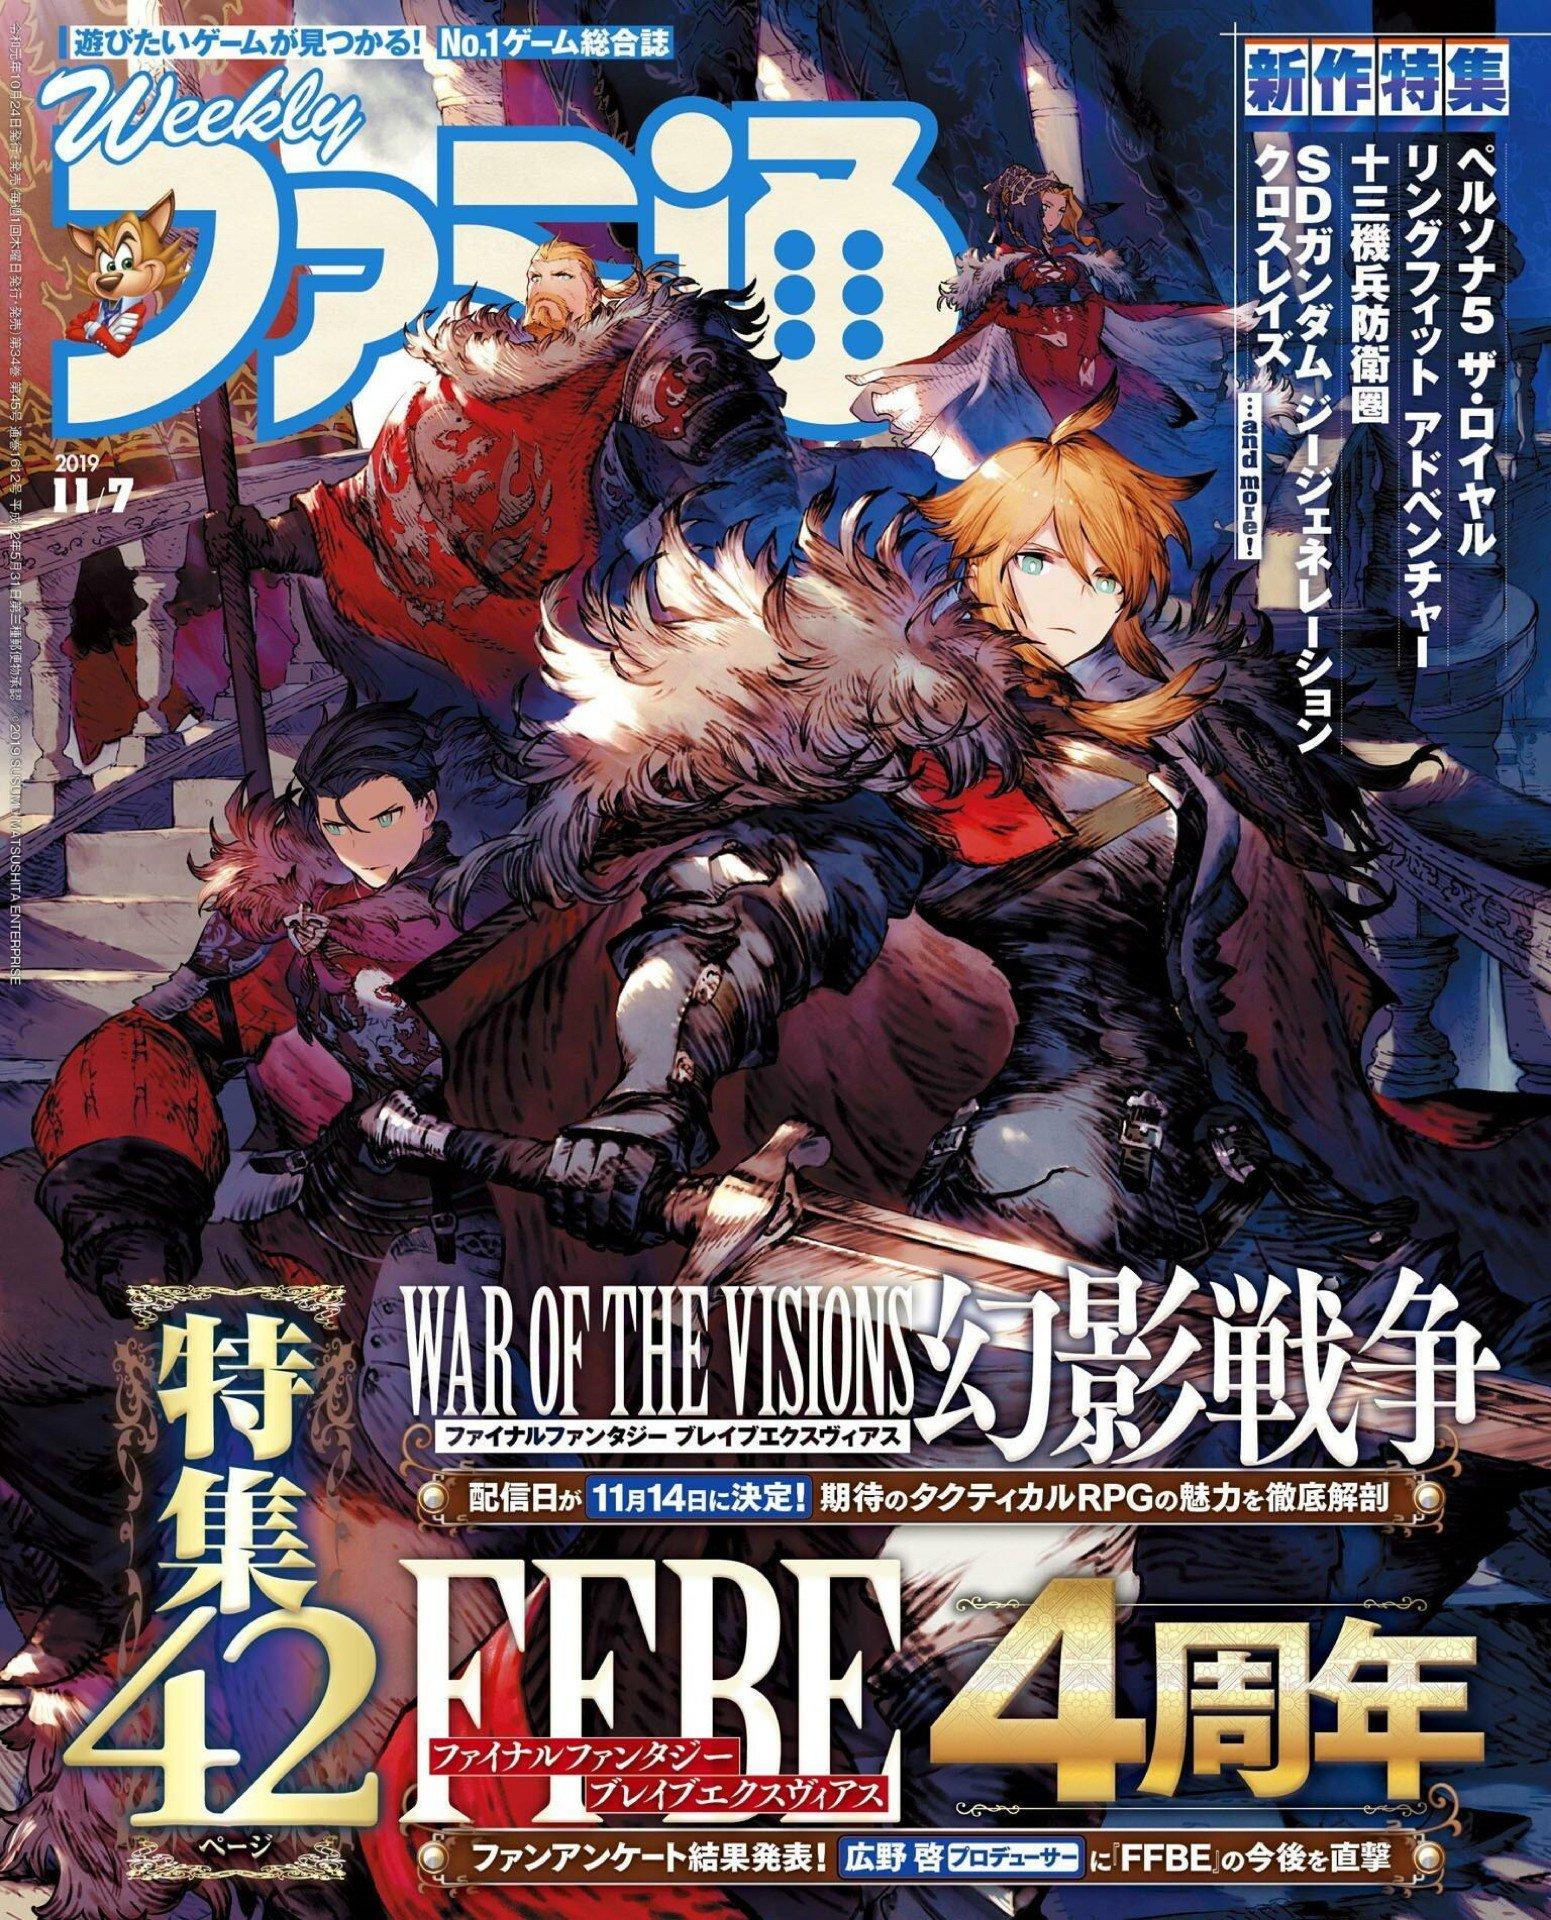 Famitsu 1612 (November 7, 2019)